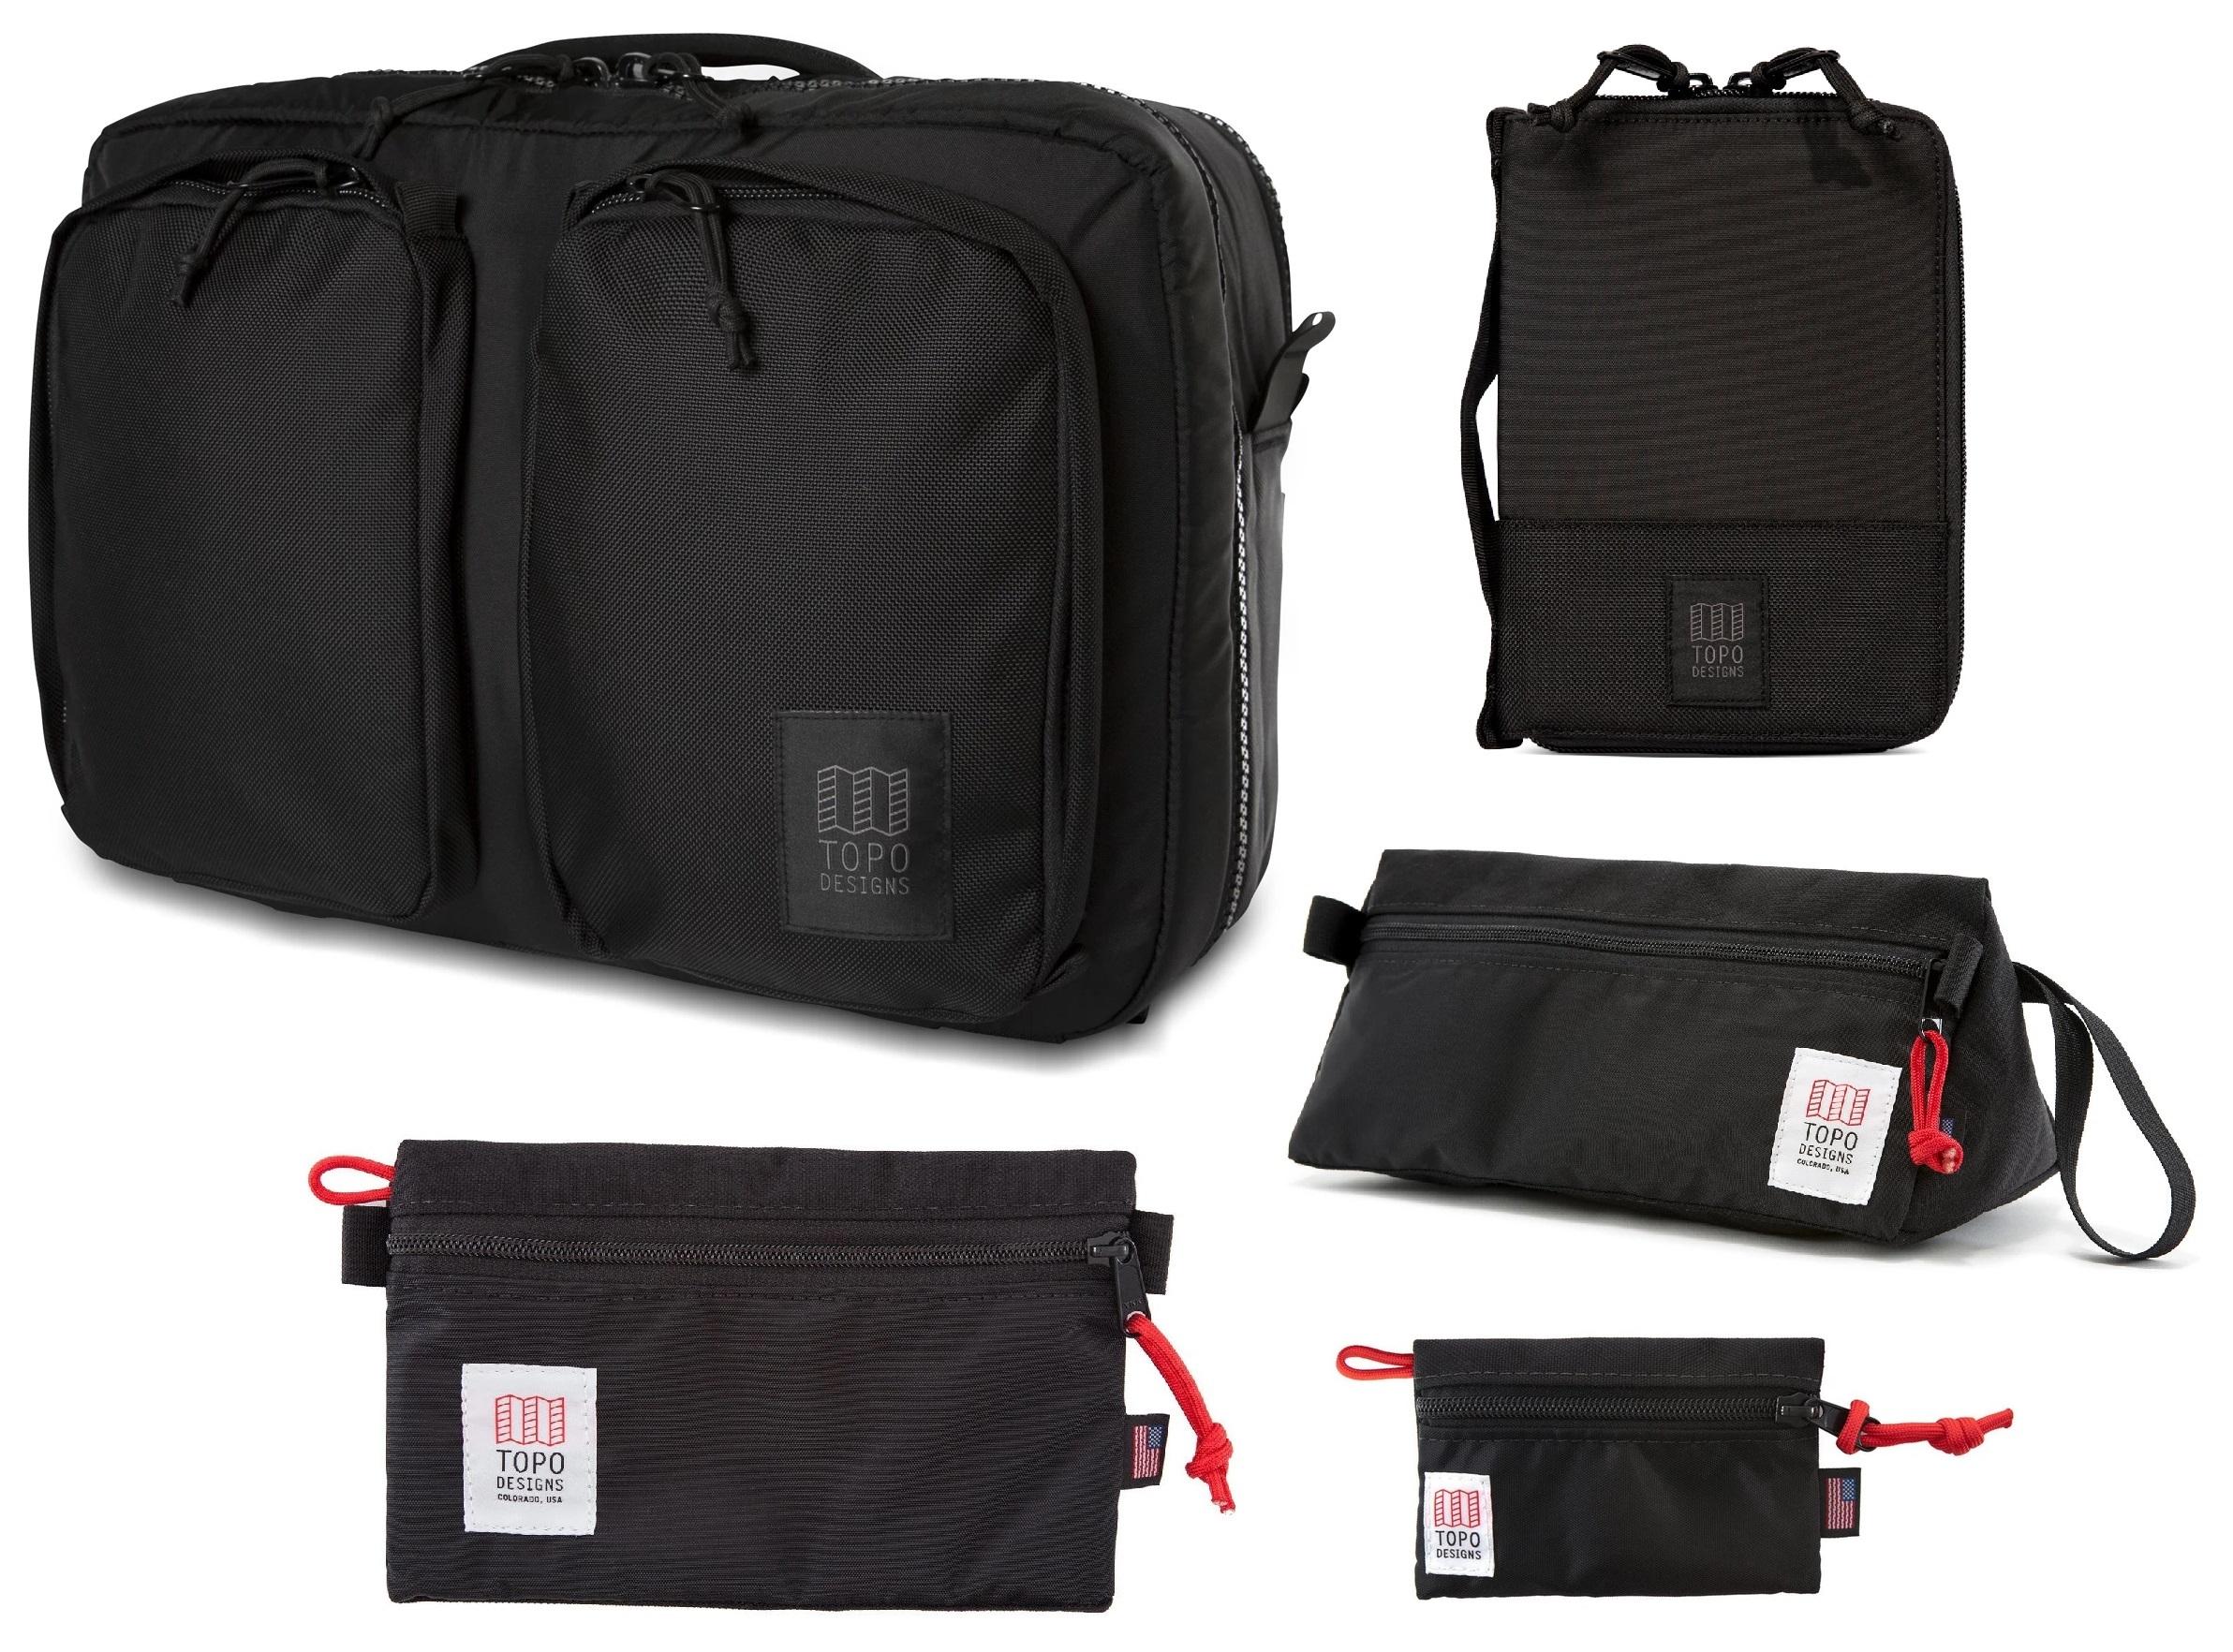 TOPO DESIGNS Global Briefcase 3-Days Kit (BLACK)